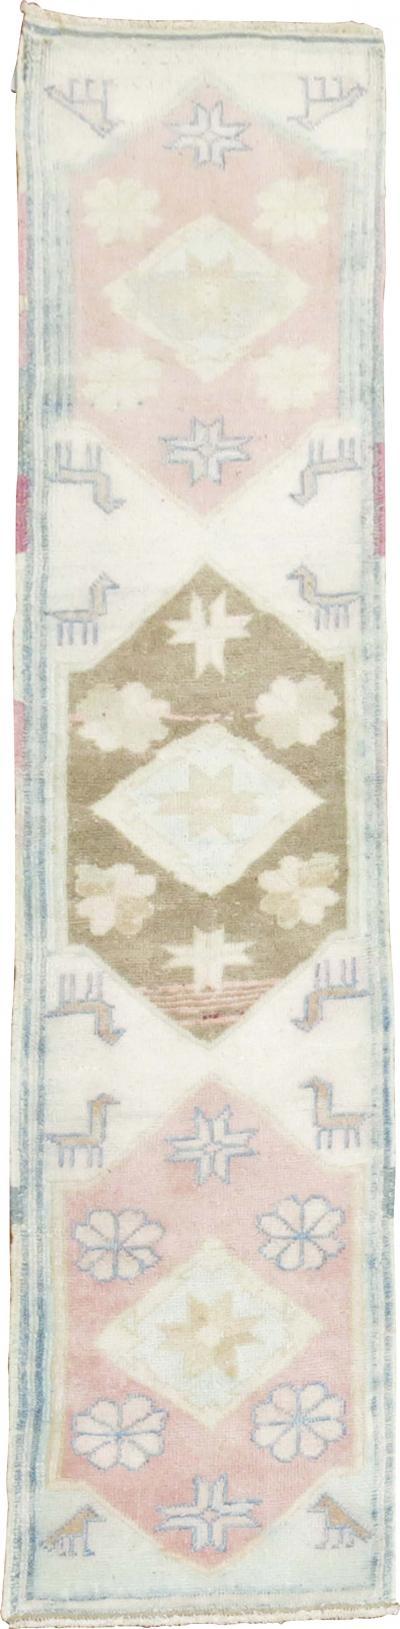 Ivory Pink Cotton Turkish RUnner rug no 31357